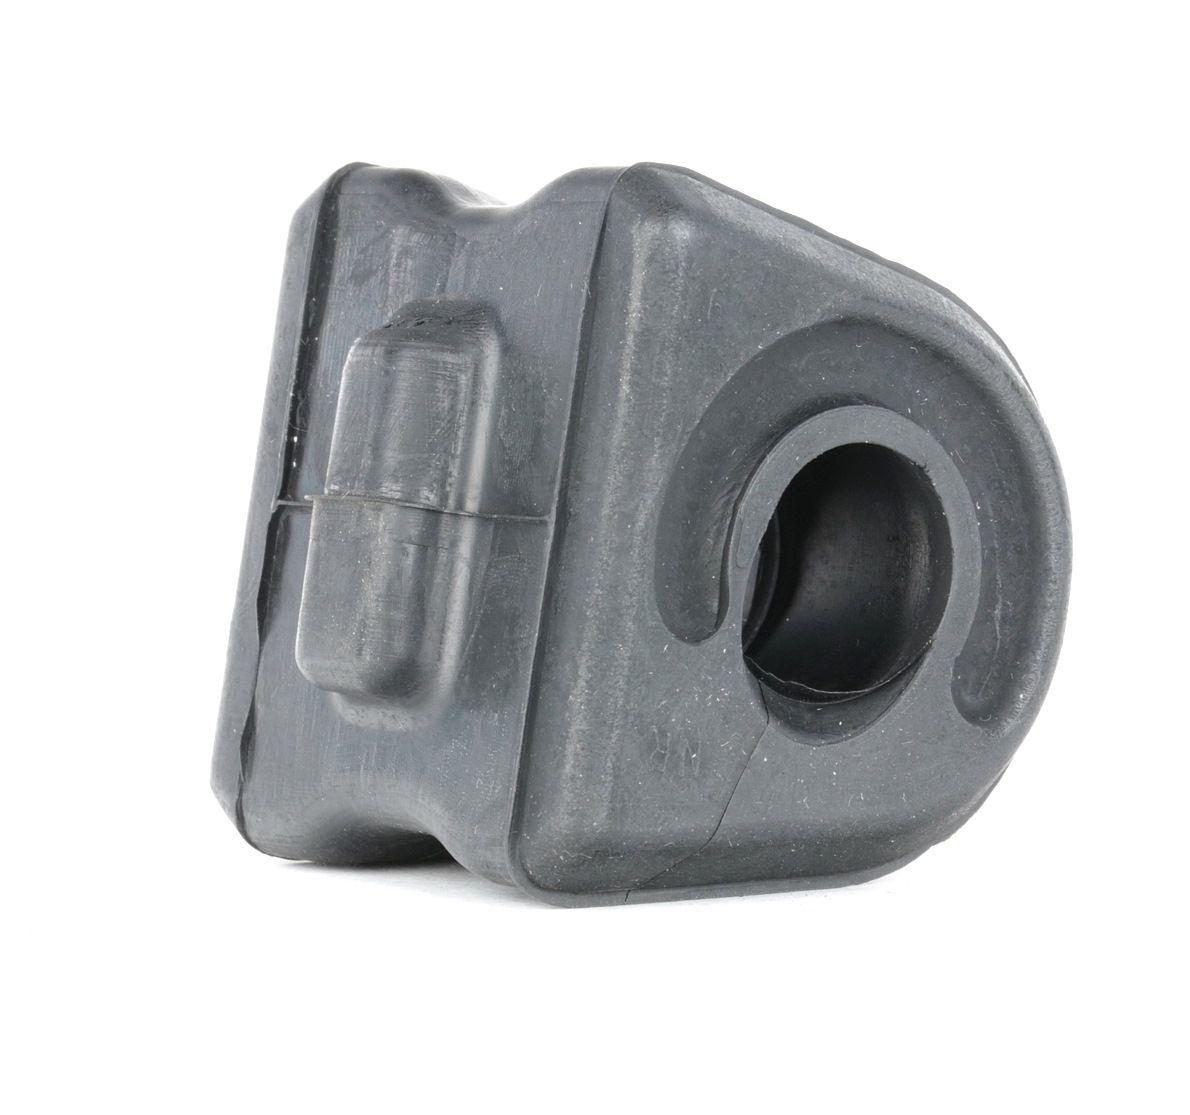 Image of MOOG Stabilizer Bushes HONDA HO-SB-13588 06510SMG305,51306SMGE01,51306SMGE02 51306SMGE11